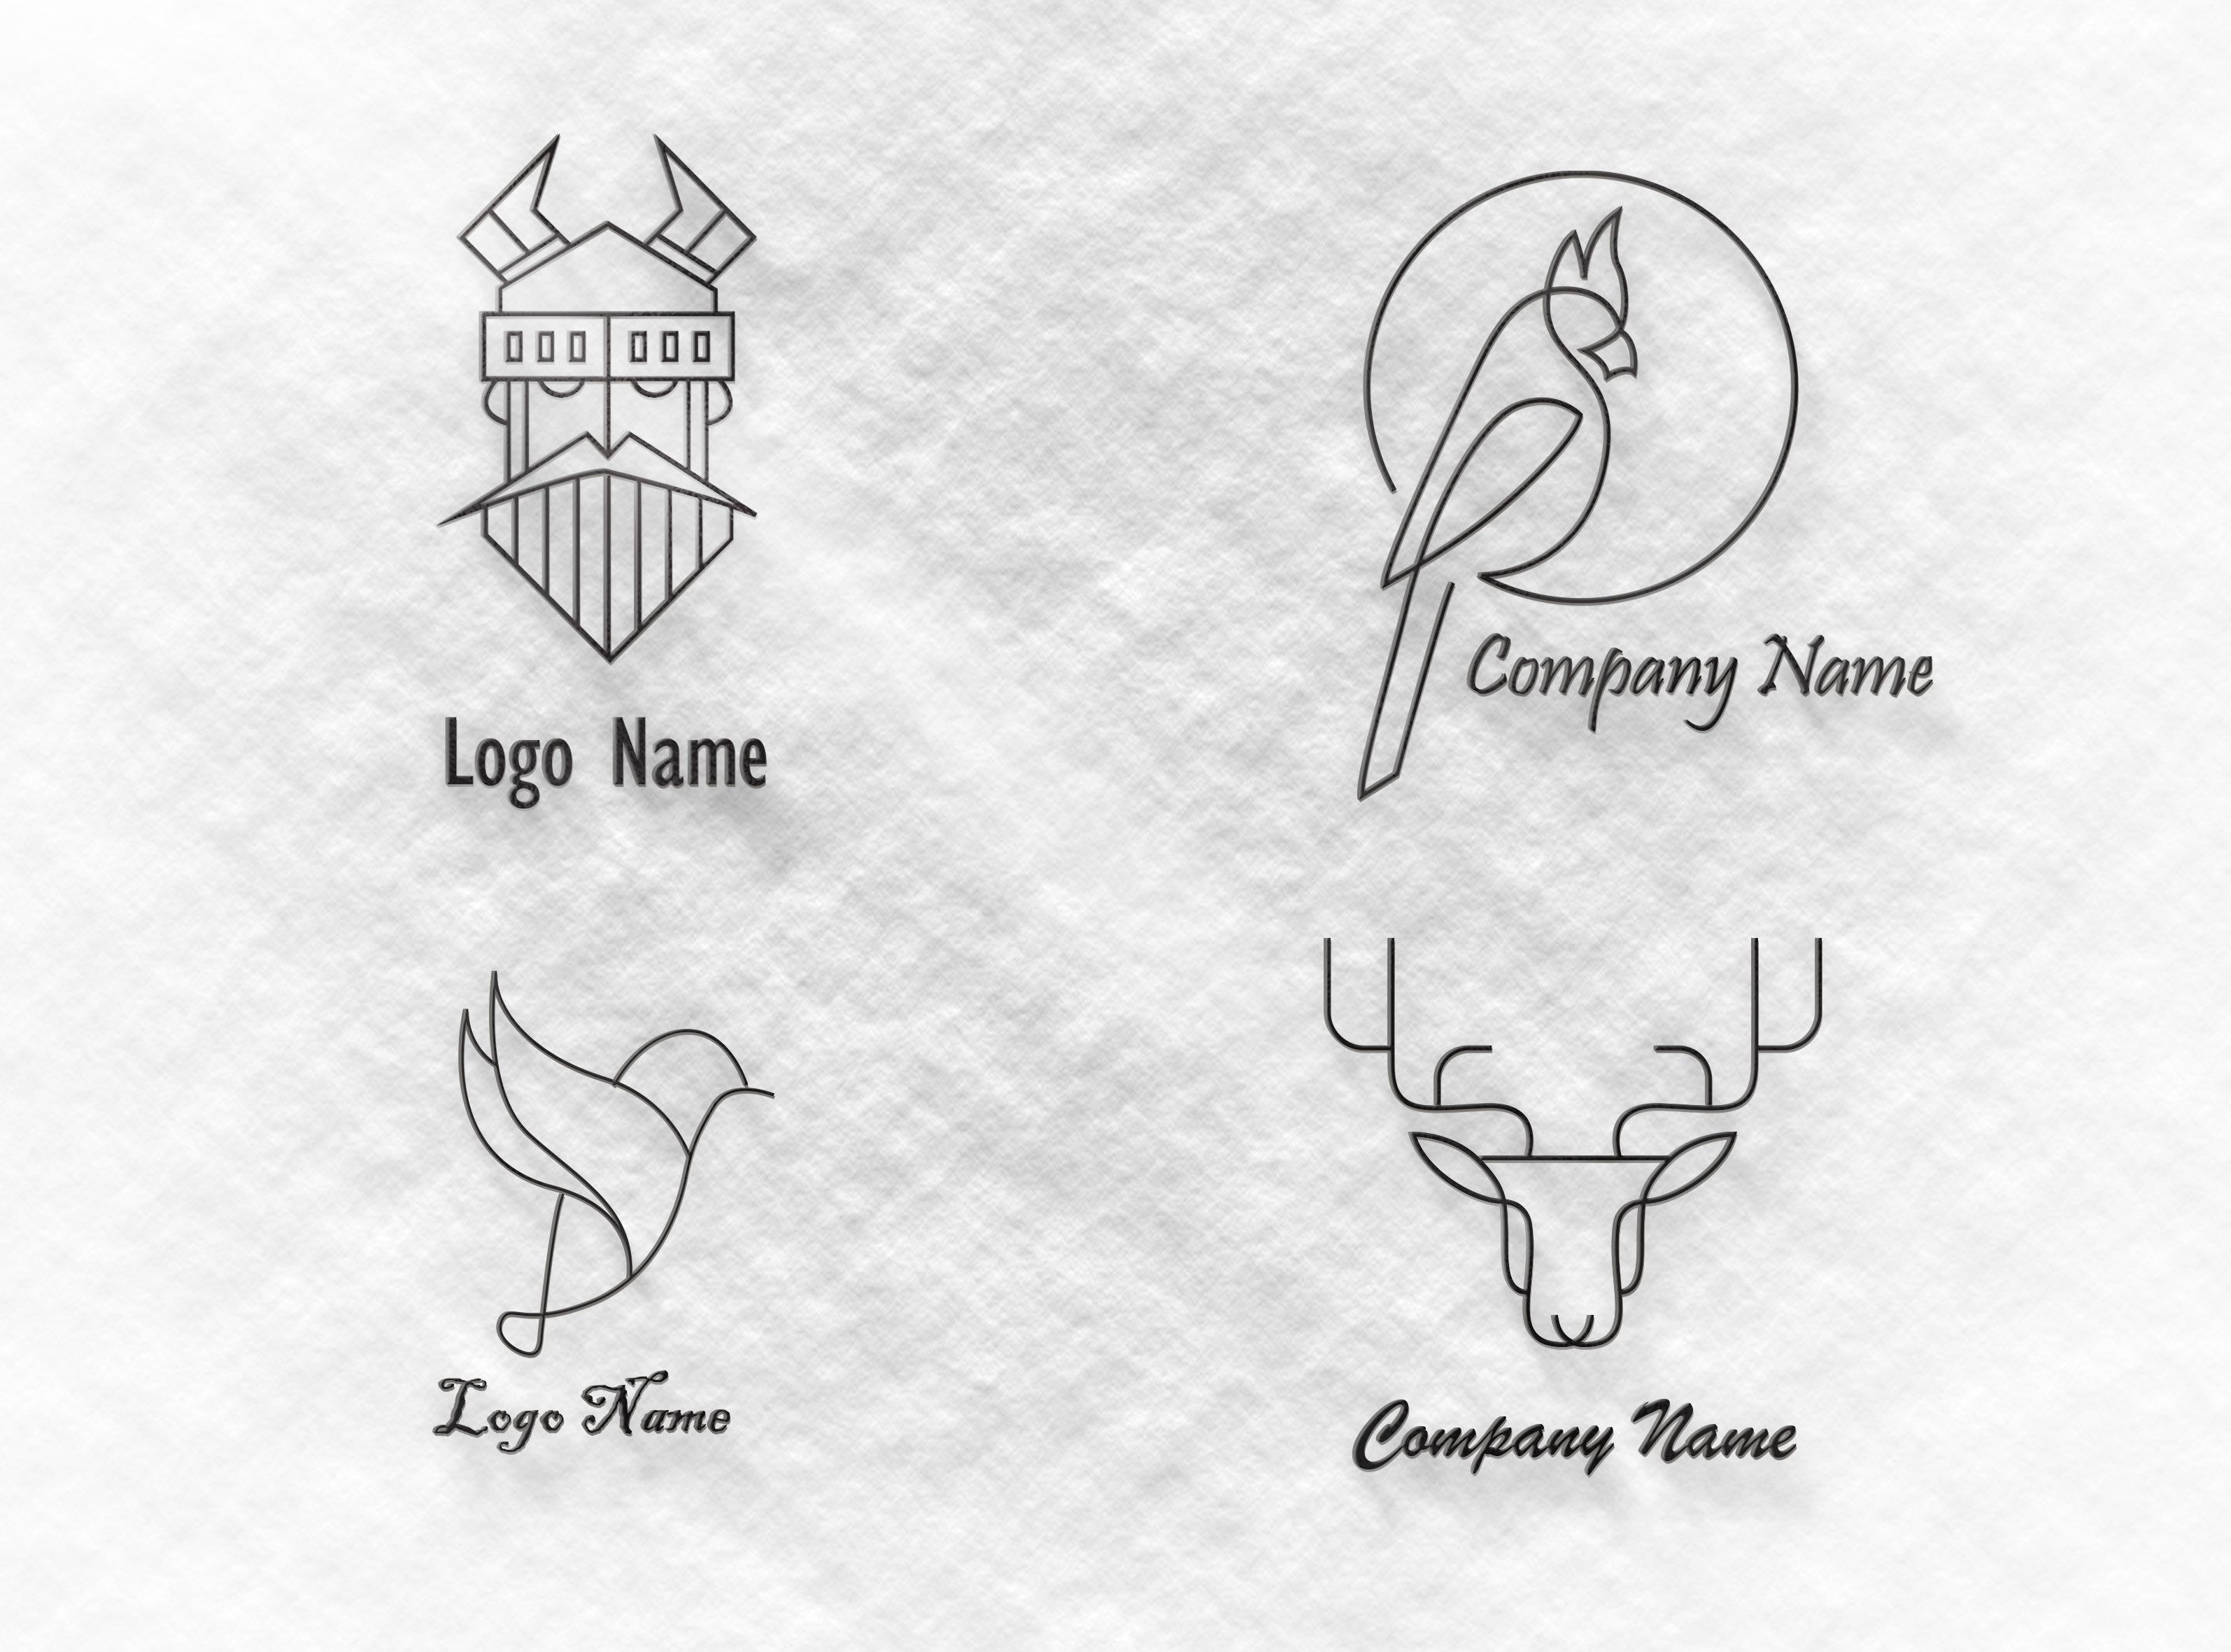 I will design single line art logo